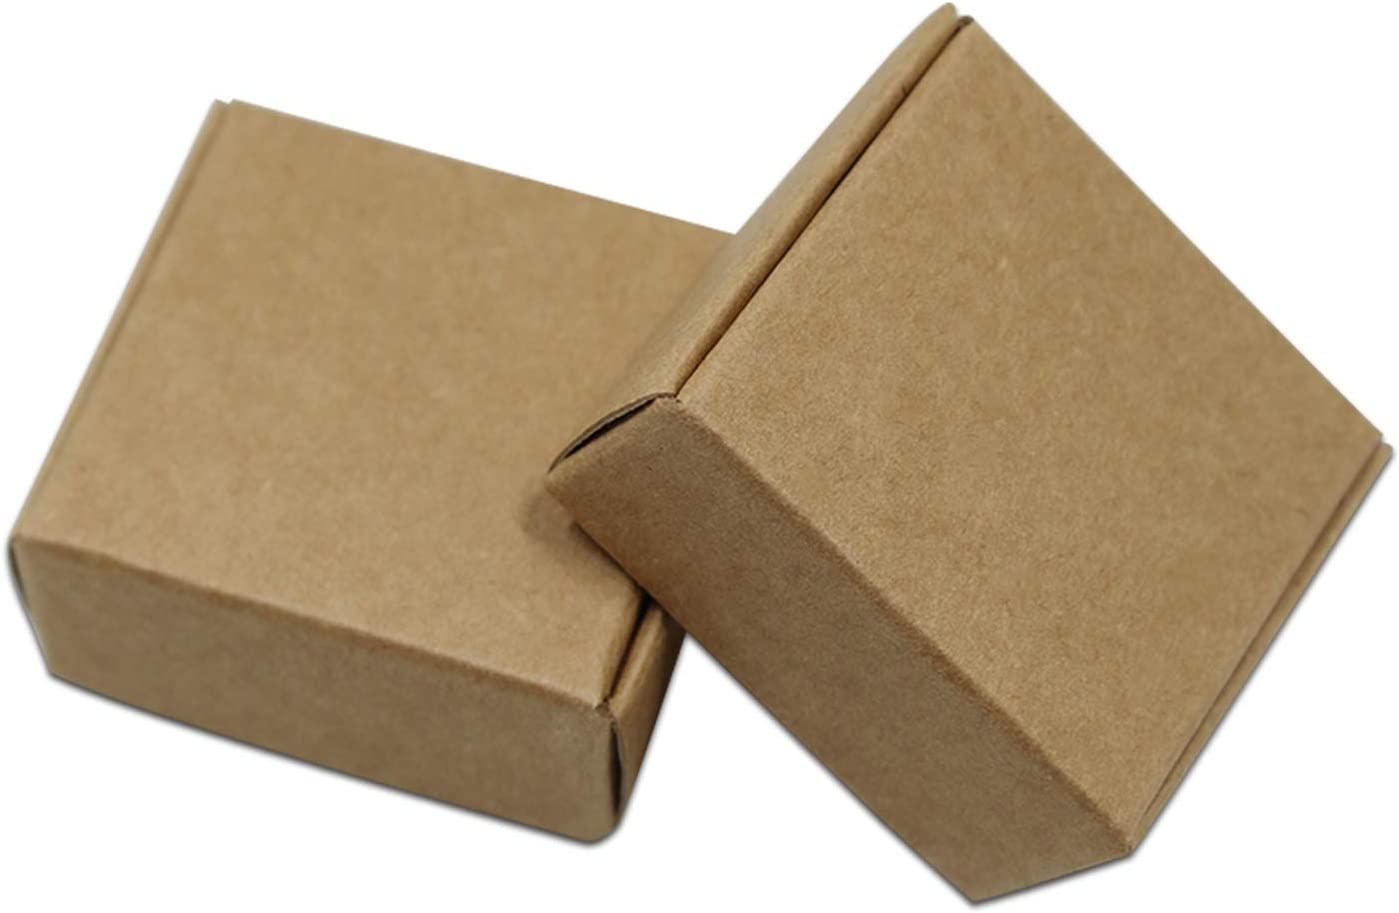 100pcs//Lot Blank Kraft Paper Box Packaging Small Cardboard Handmade Soap Gift Box for Wedding Craft Jewelry Candy Box Folding,3.7x3.7x2cm